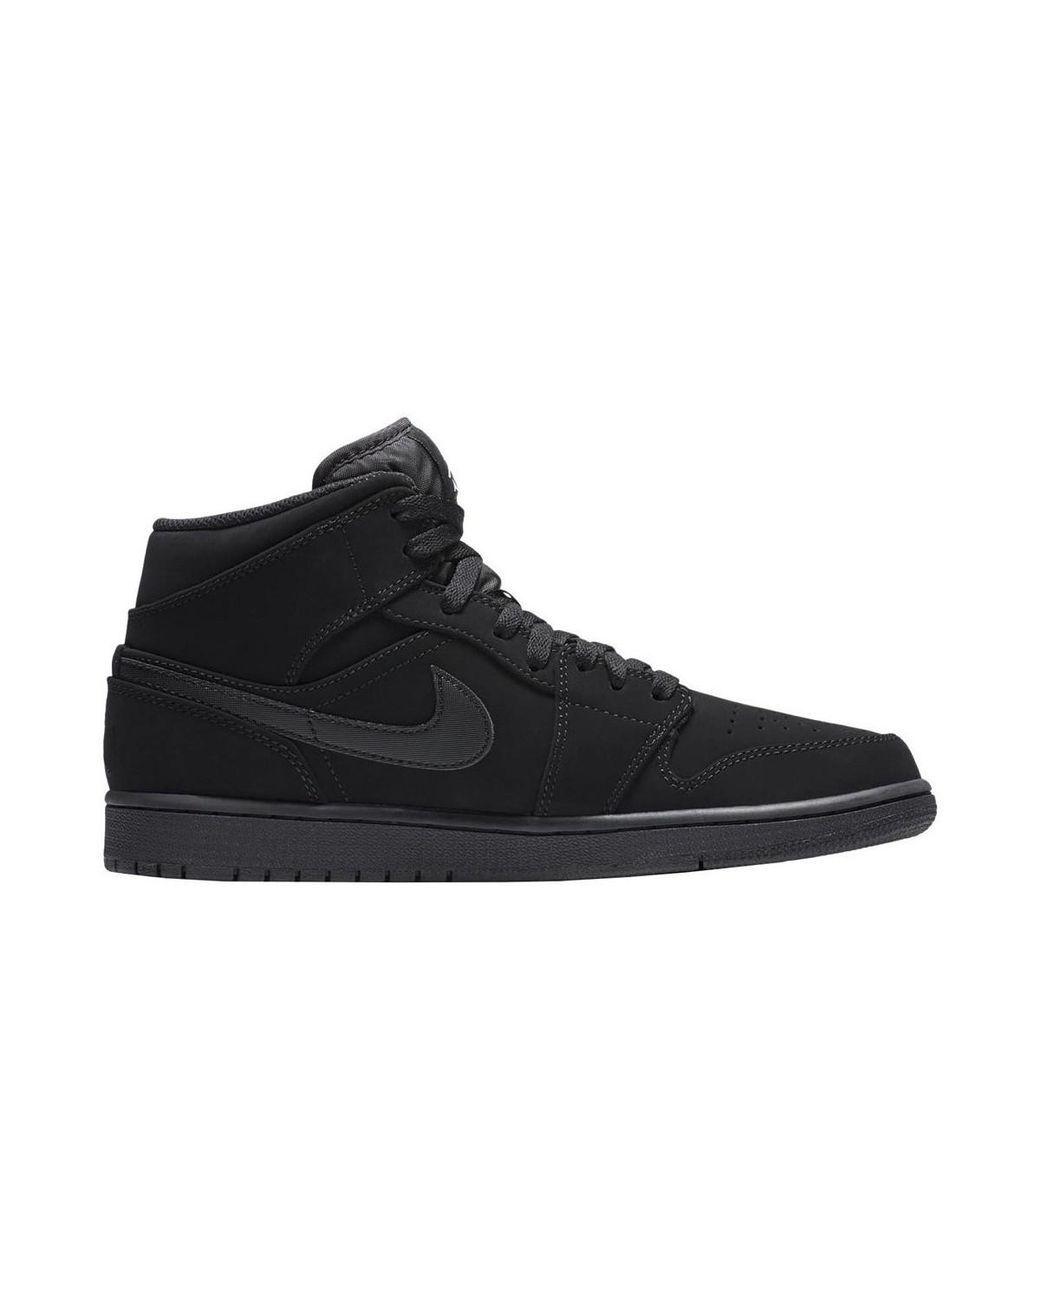 531e7a541b0eed Nike